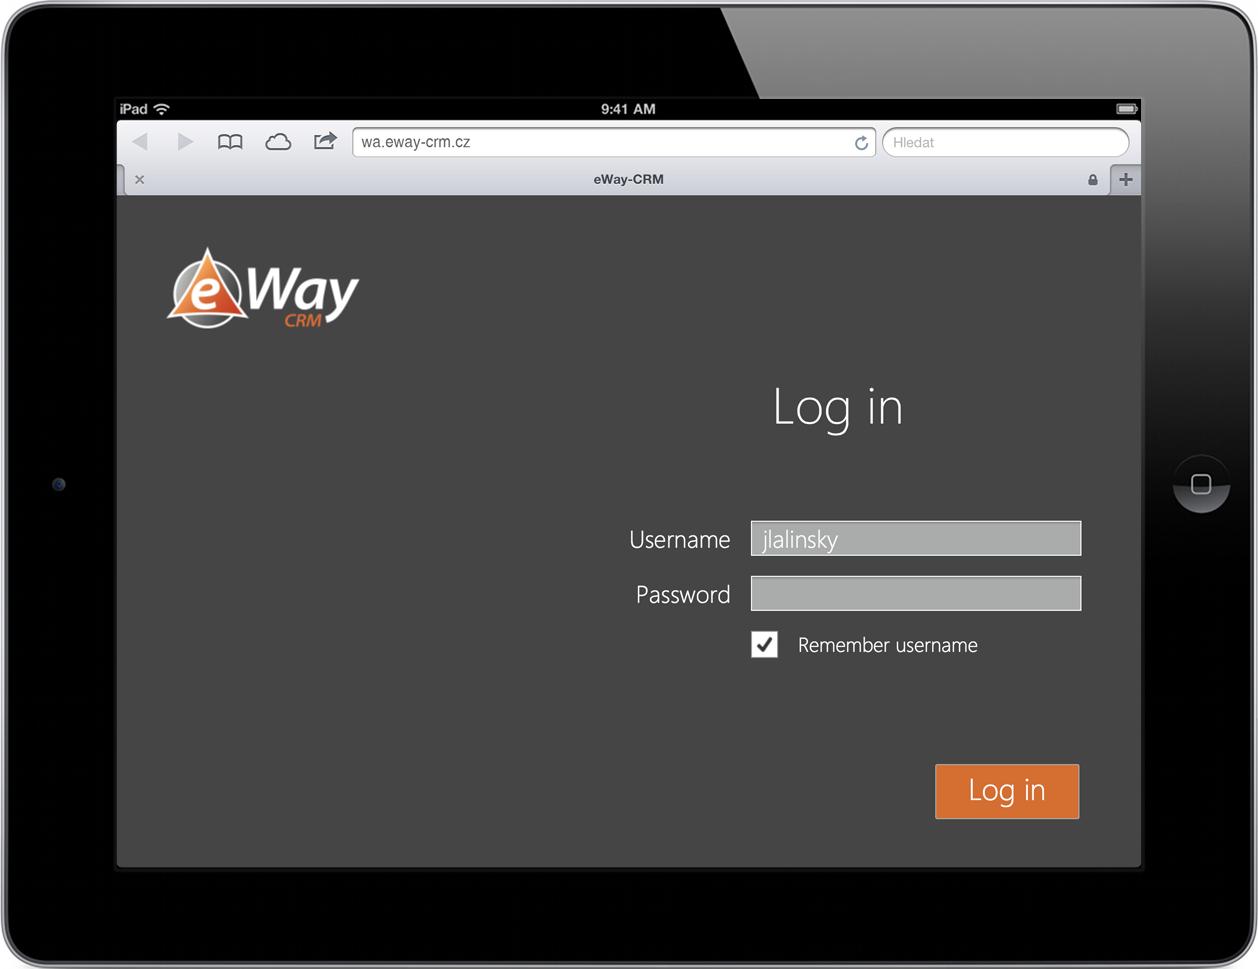 eWay-CRM Web Access Log In Screen